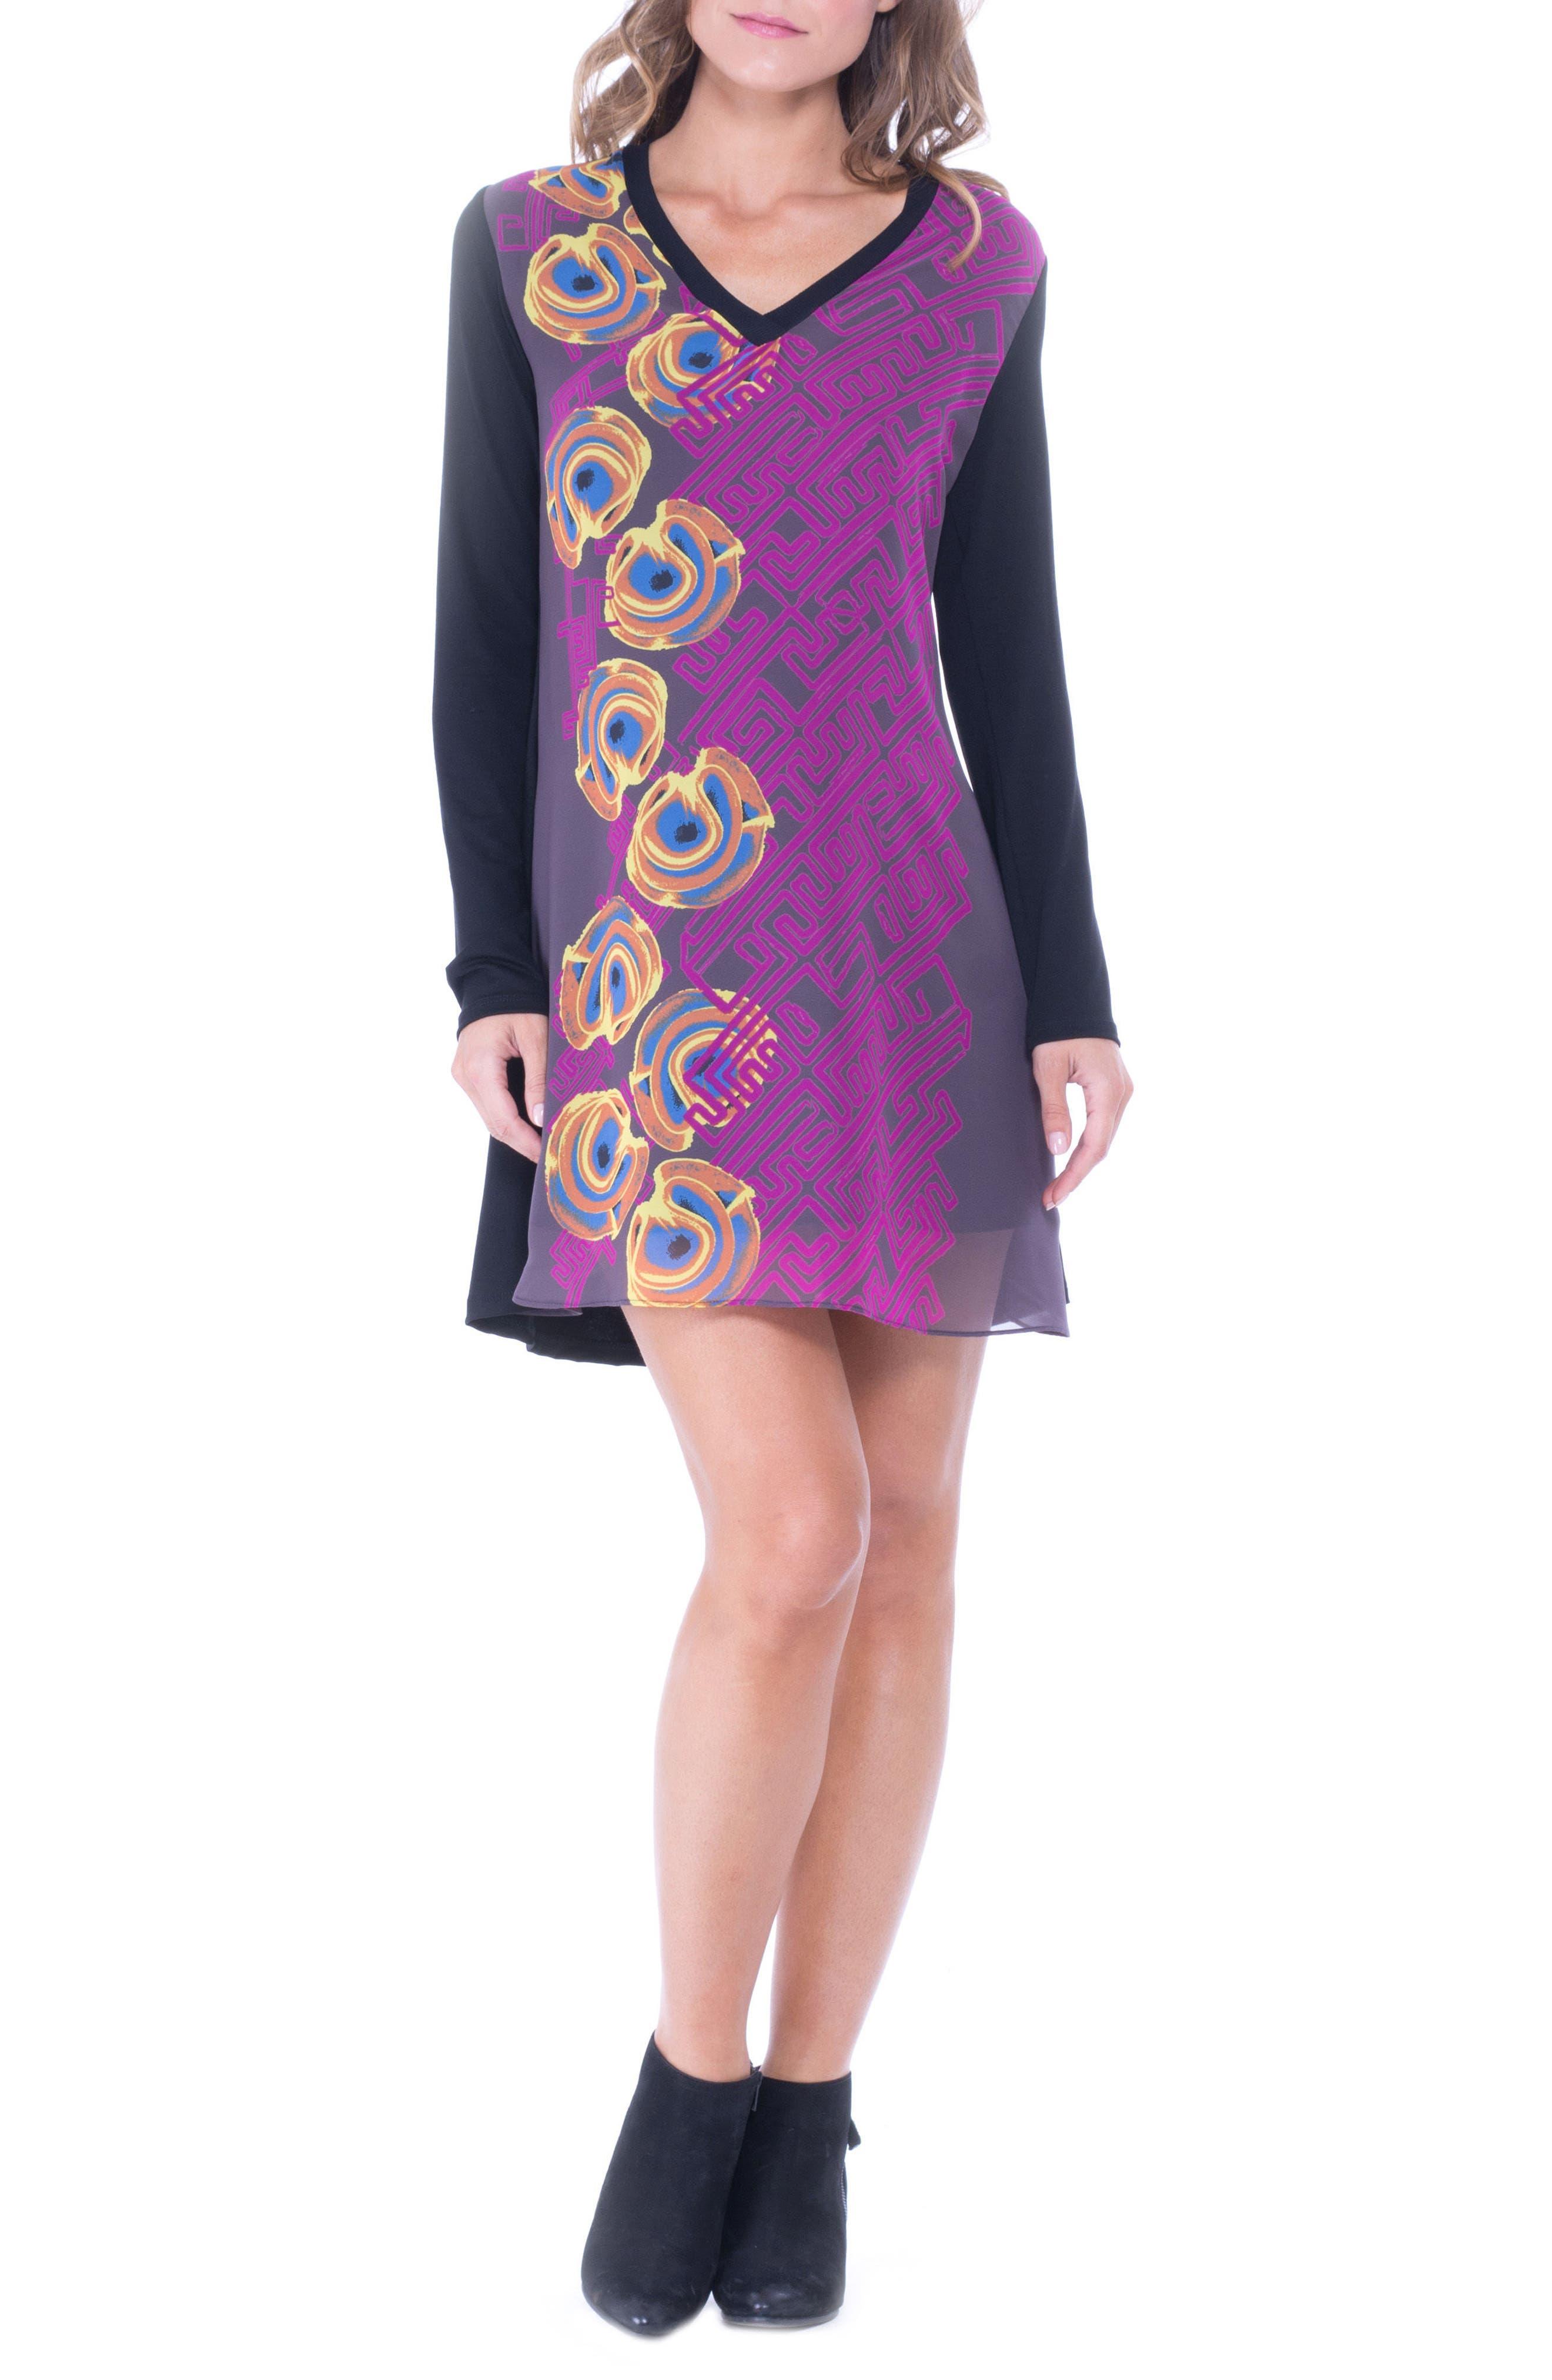 Olian Graphic Chiffon Overlay Maternity Dress